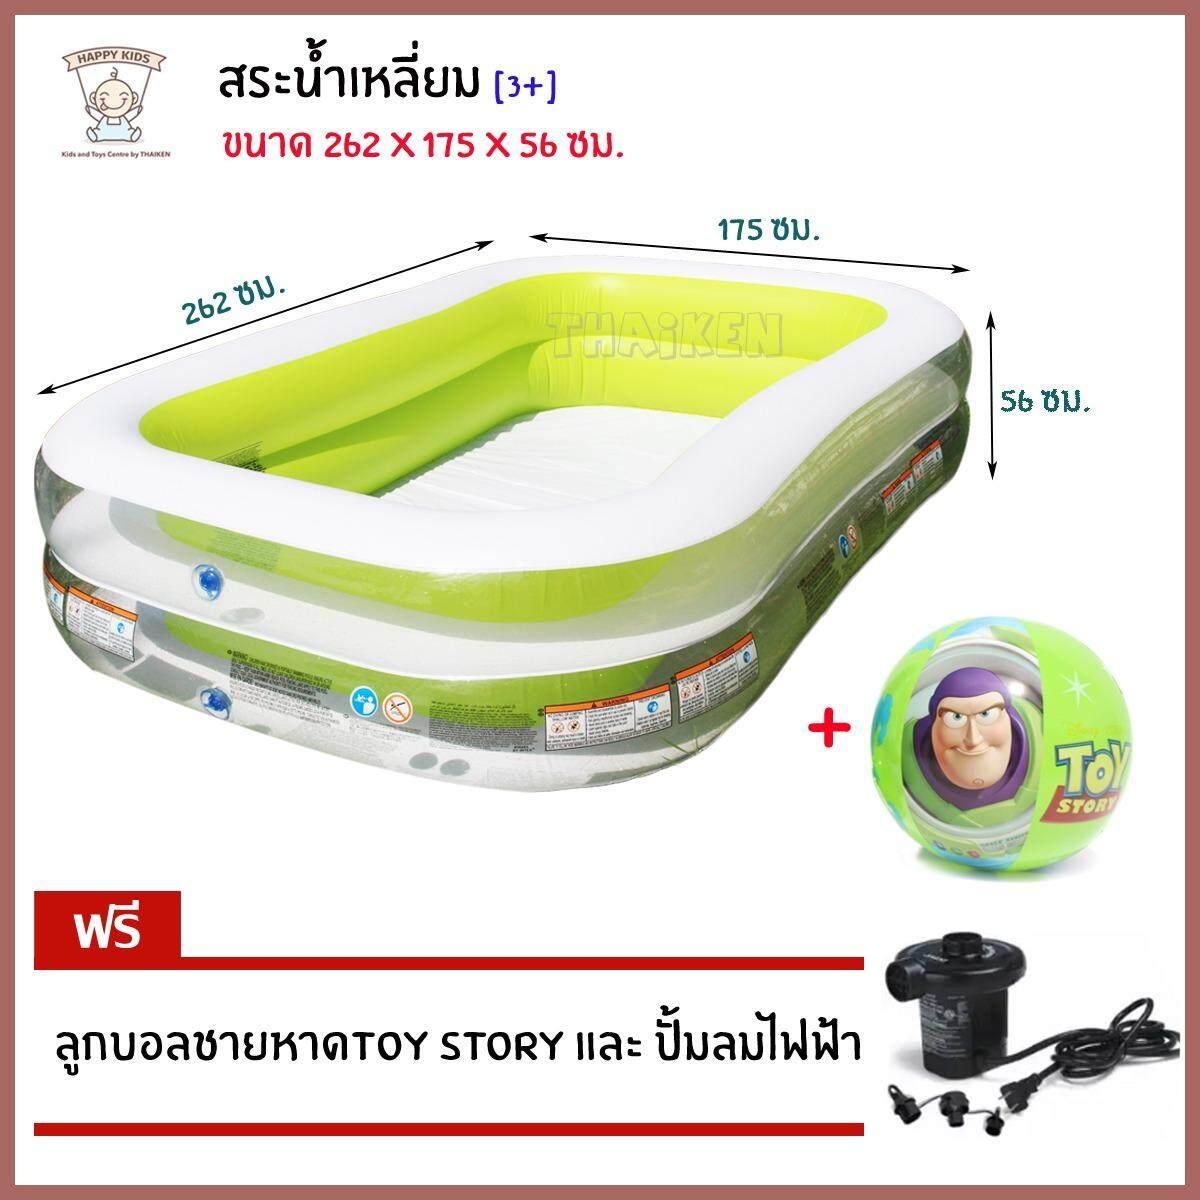 Thaiken สระน้ำเหลี่ยม 262X175X56Cm สีเขียว Swim Center Family Pool Intex Green แถมสูบลมไฟฟ้า ลูกบอลชายหาด 56483 58037 616 ใหม่ล่าสุด